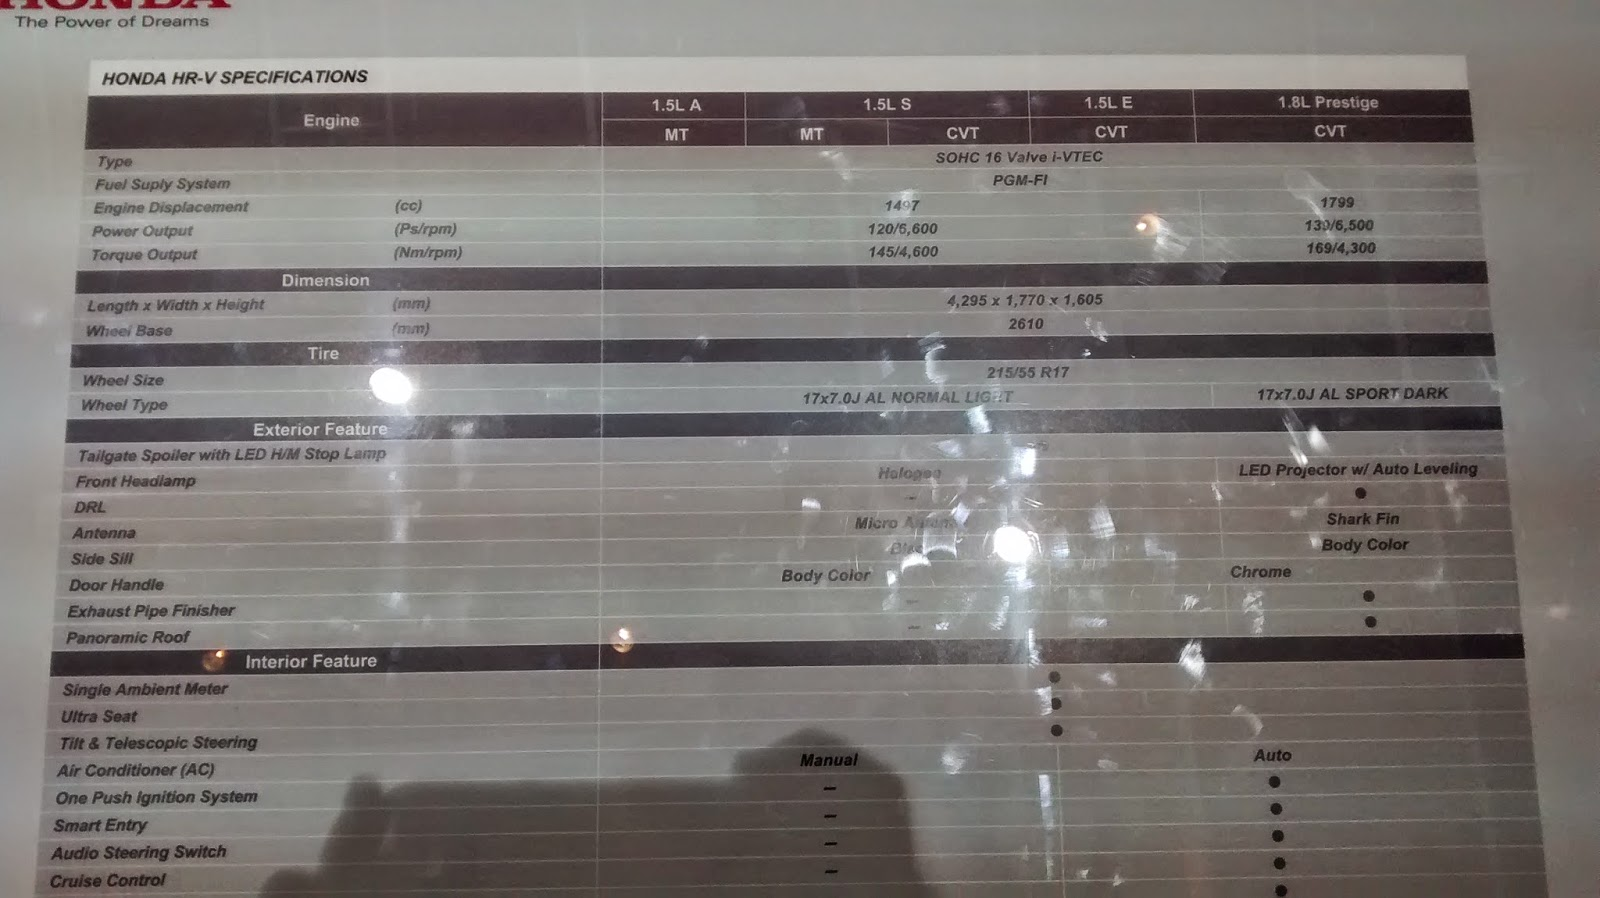 Spesifikasi Honda HR-V Indonesia